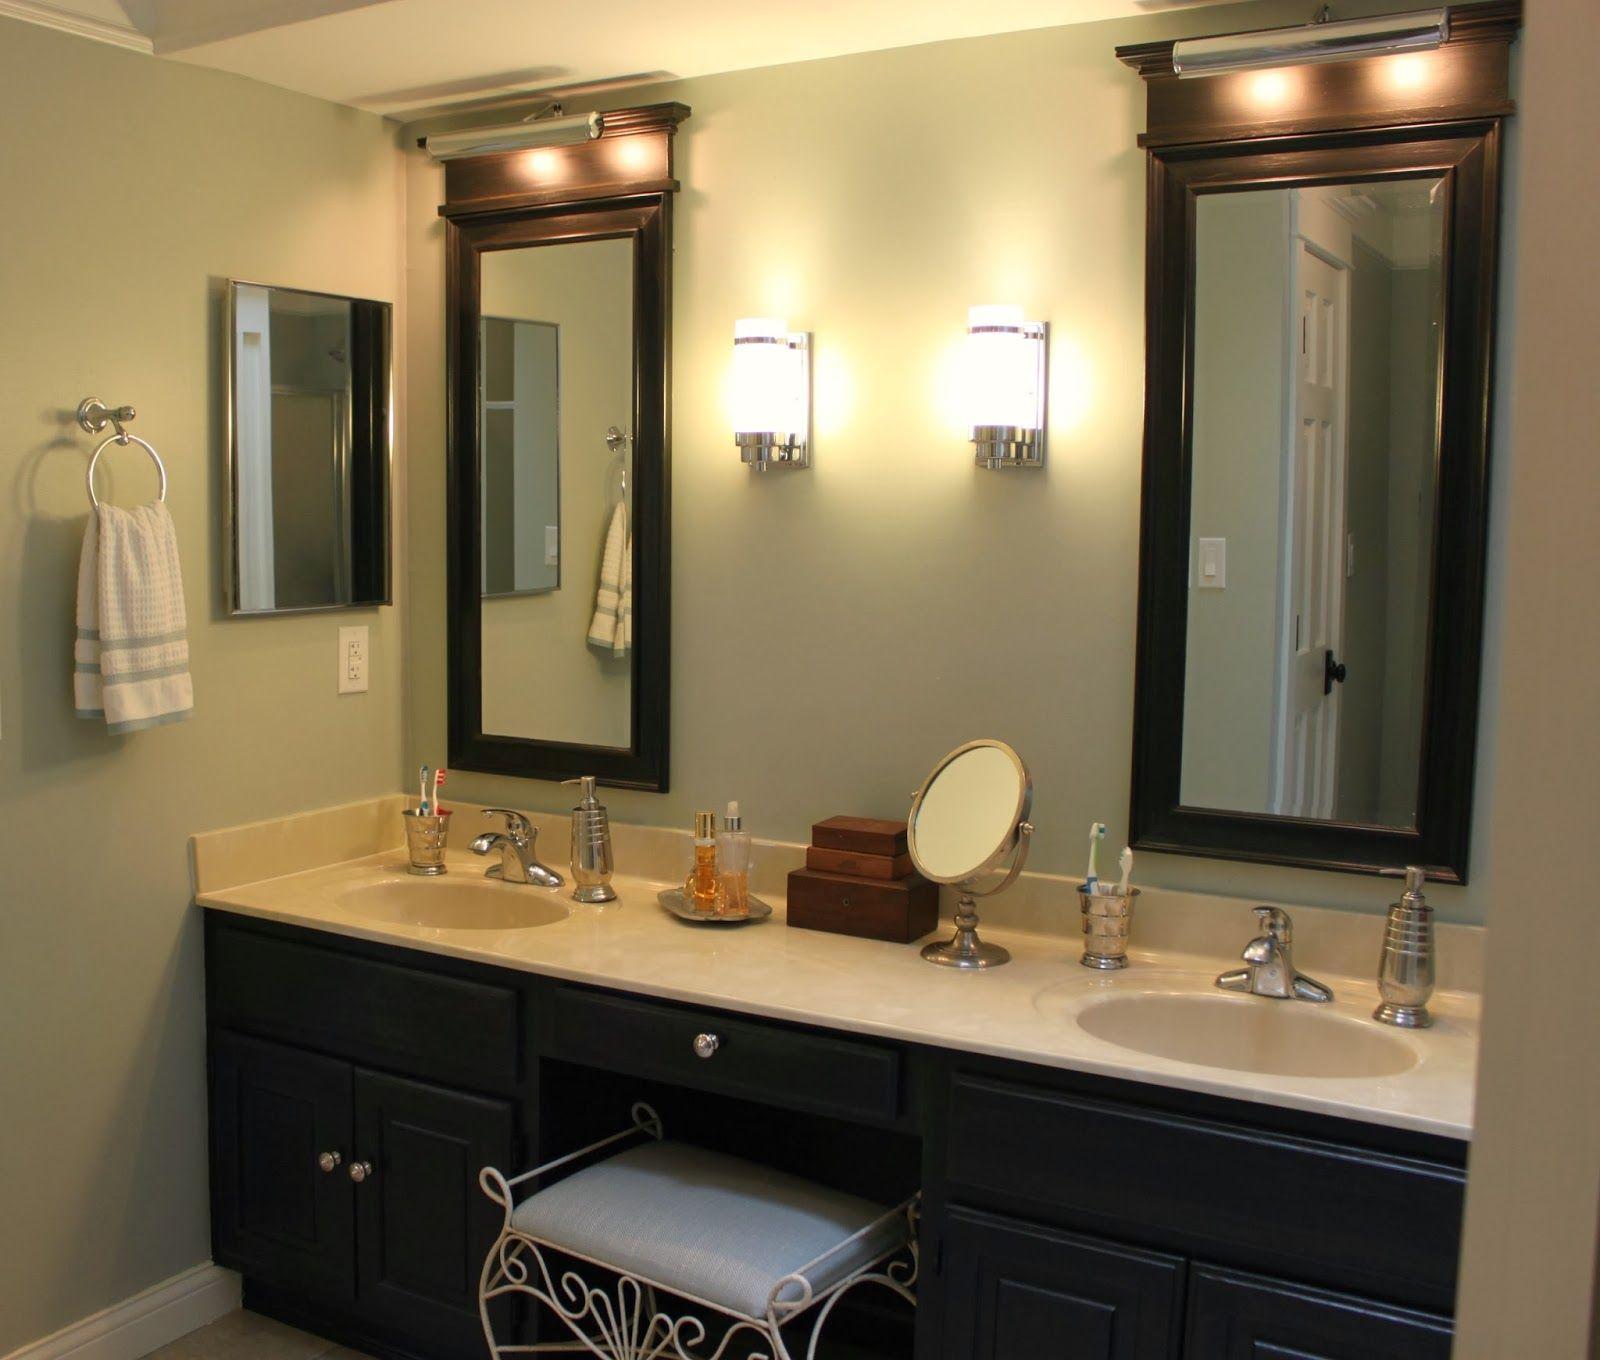 25 DIY Vanity Mirror Ideas with Lights Beautiful